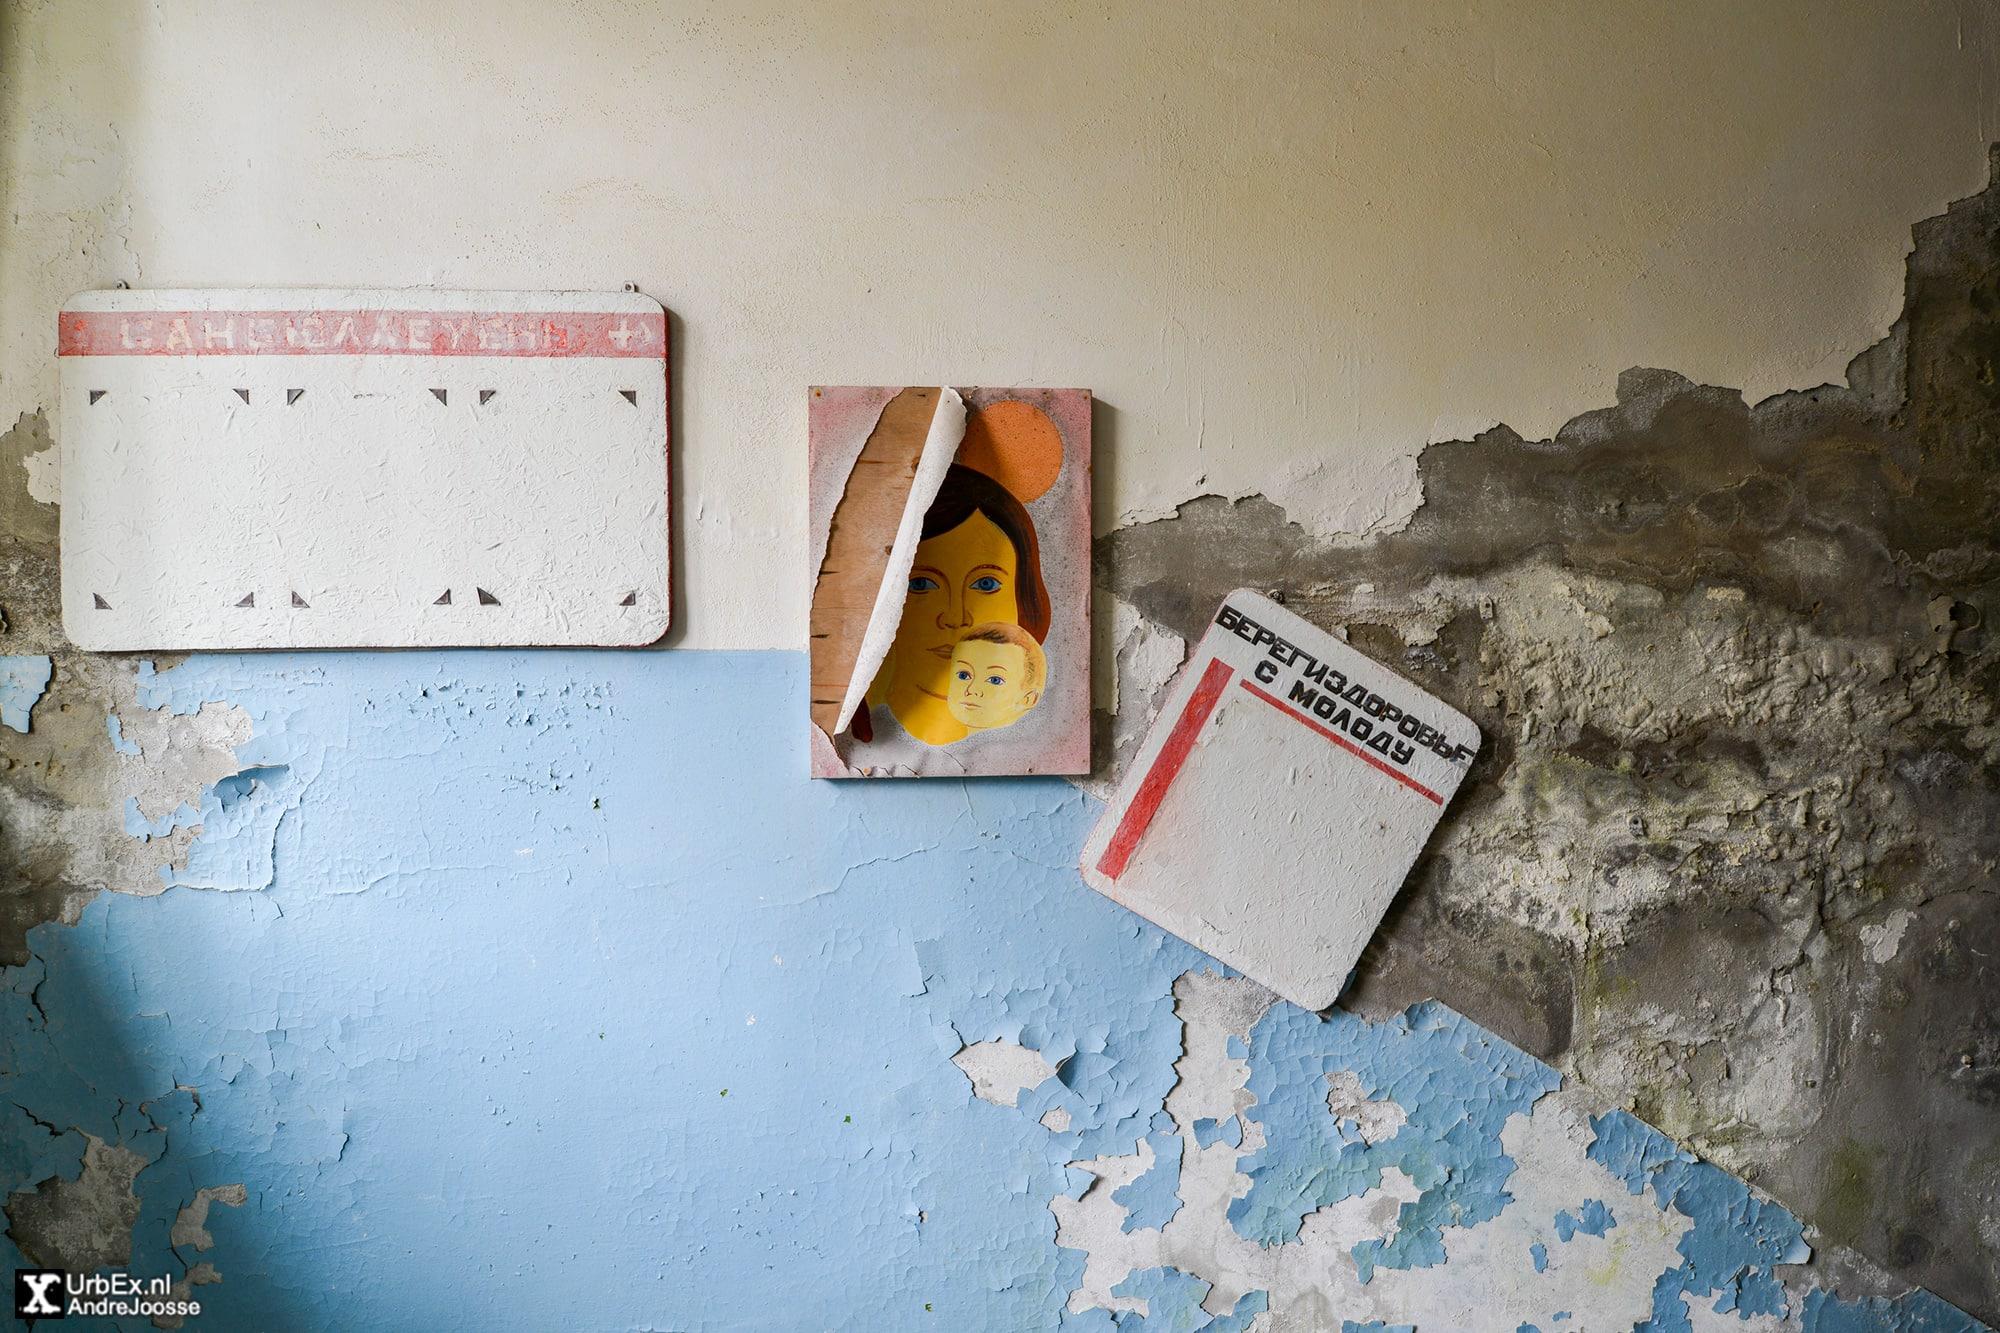 Chernobyl-2 Kindergarten